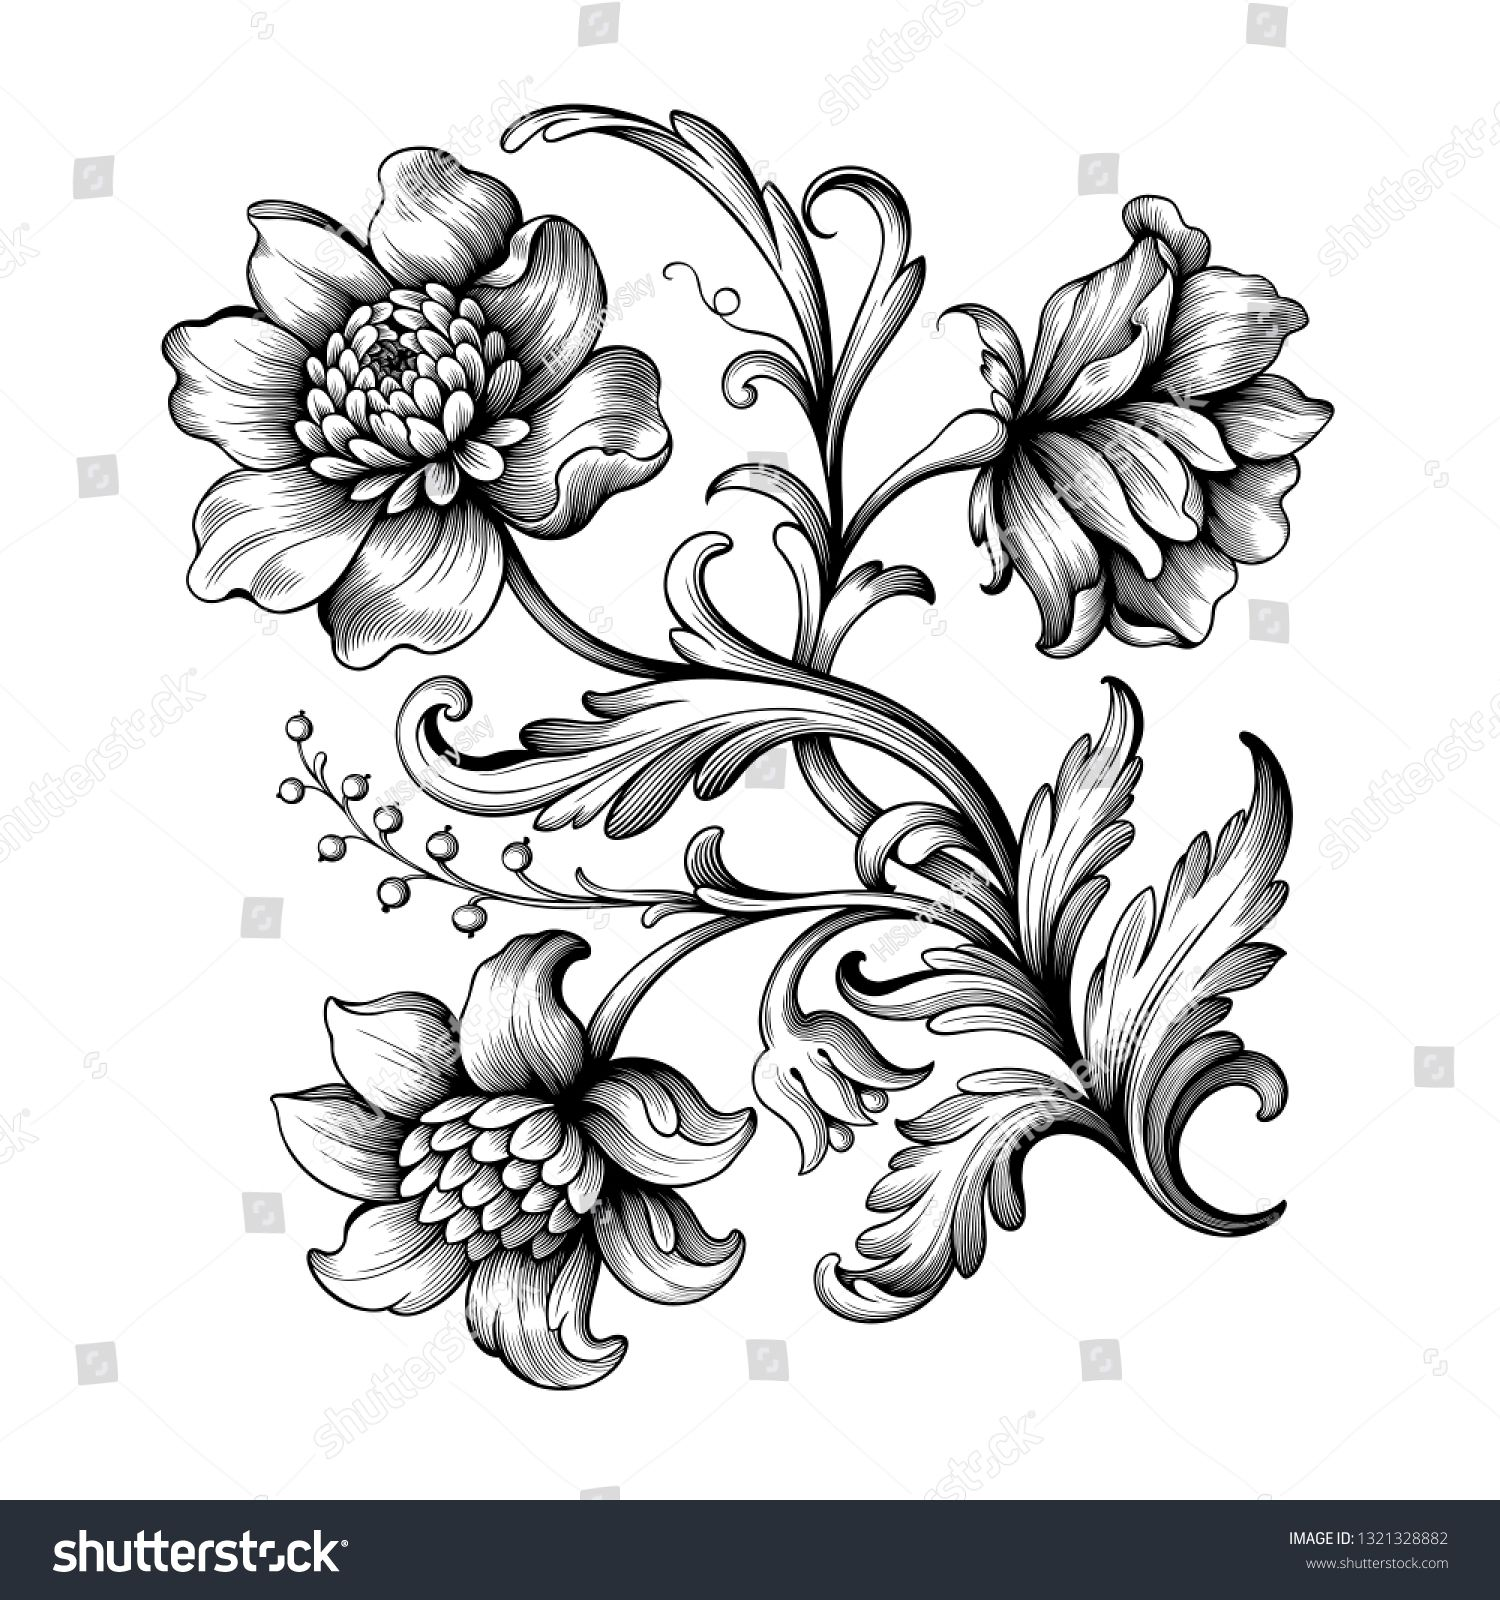 Flower Vintage Scroll Baroque Victorian Frame Border Rose Peony Floral Ornament Leaf Engraved Retro Patter In 2020 Vintage Flower Tattoo Filigree Tattoo Vintage Tattoo